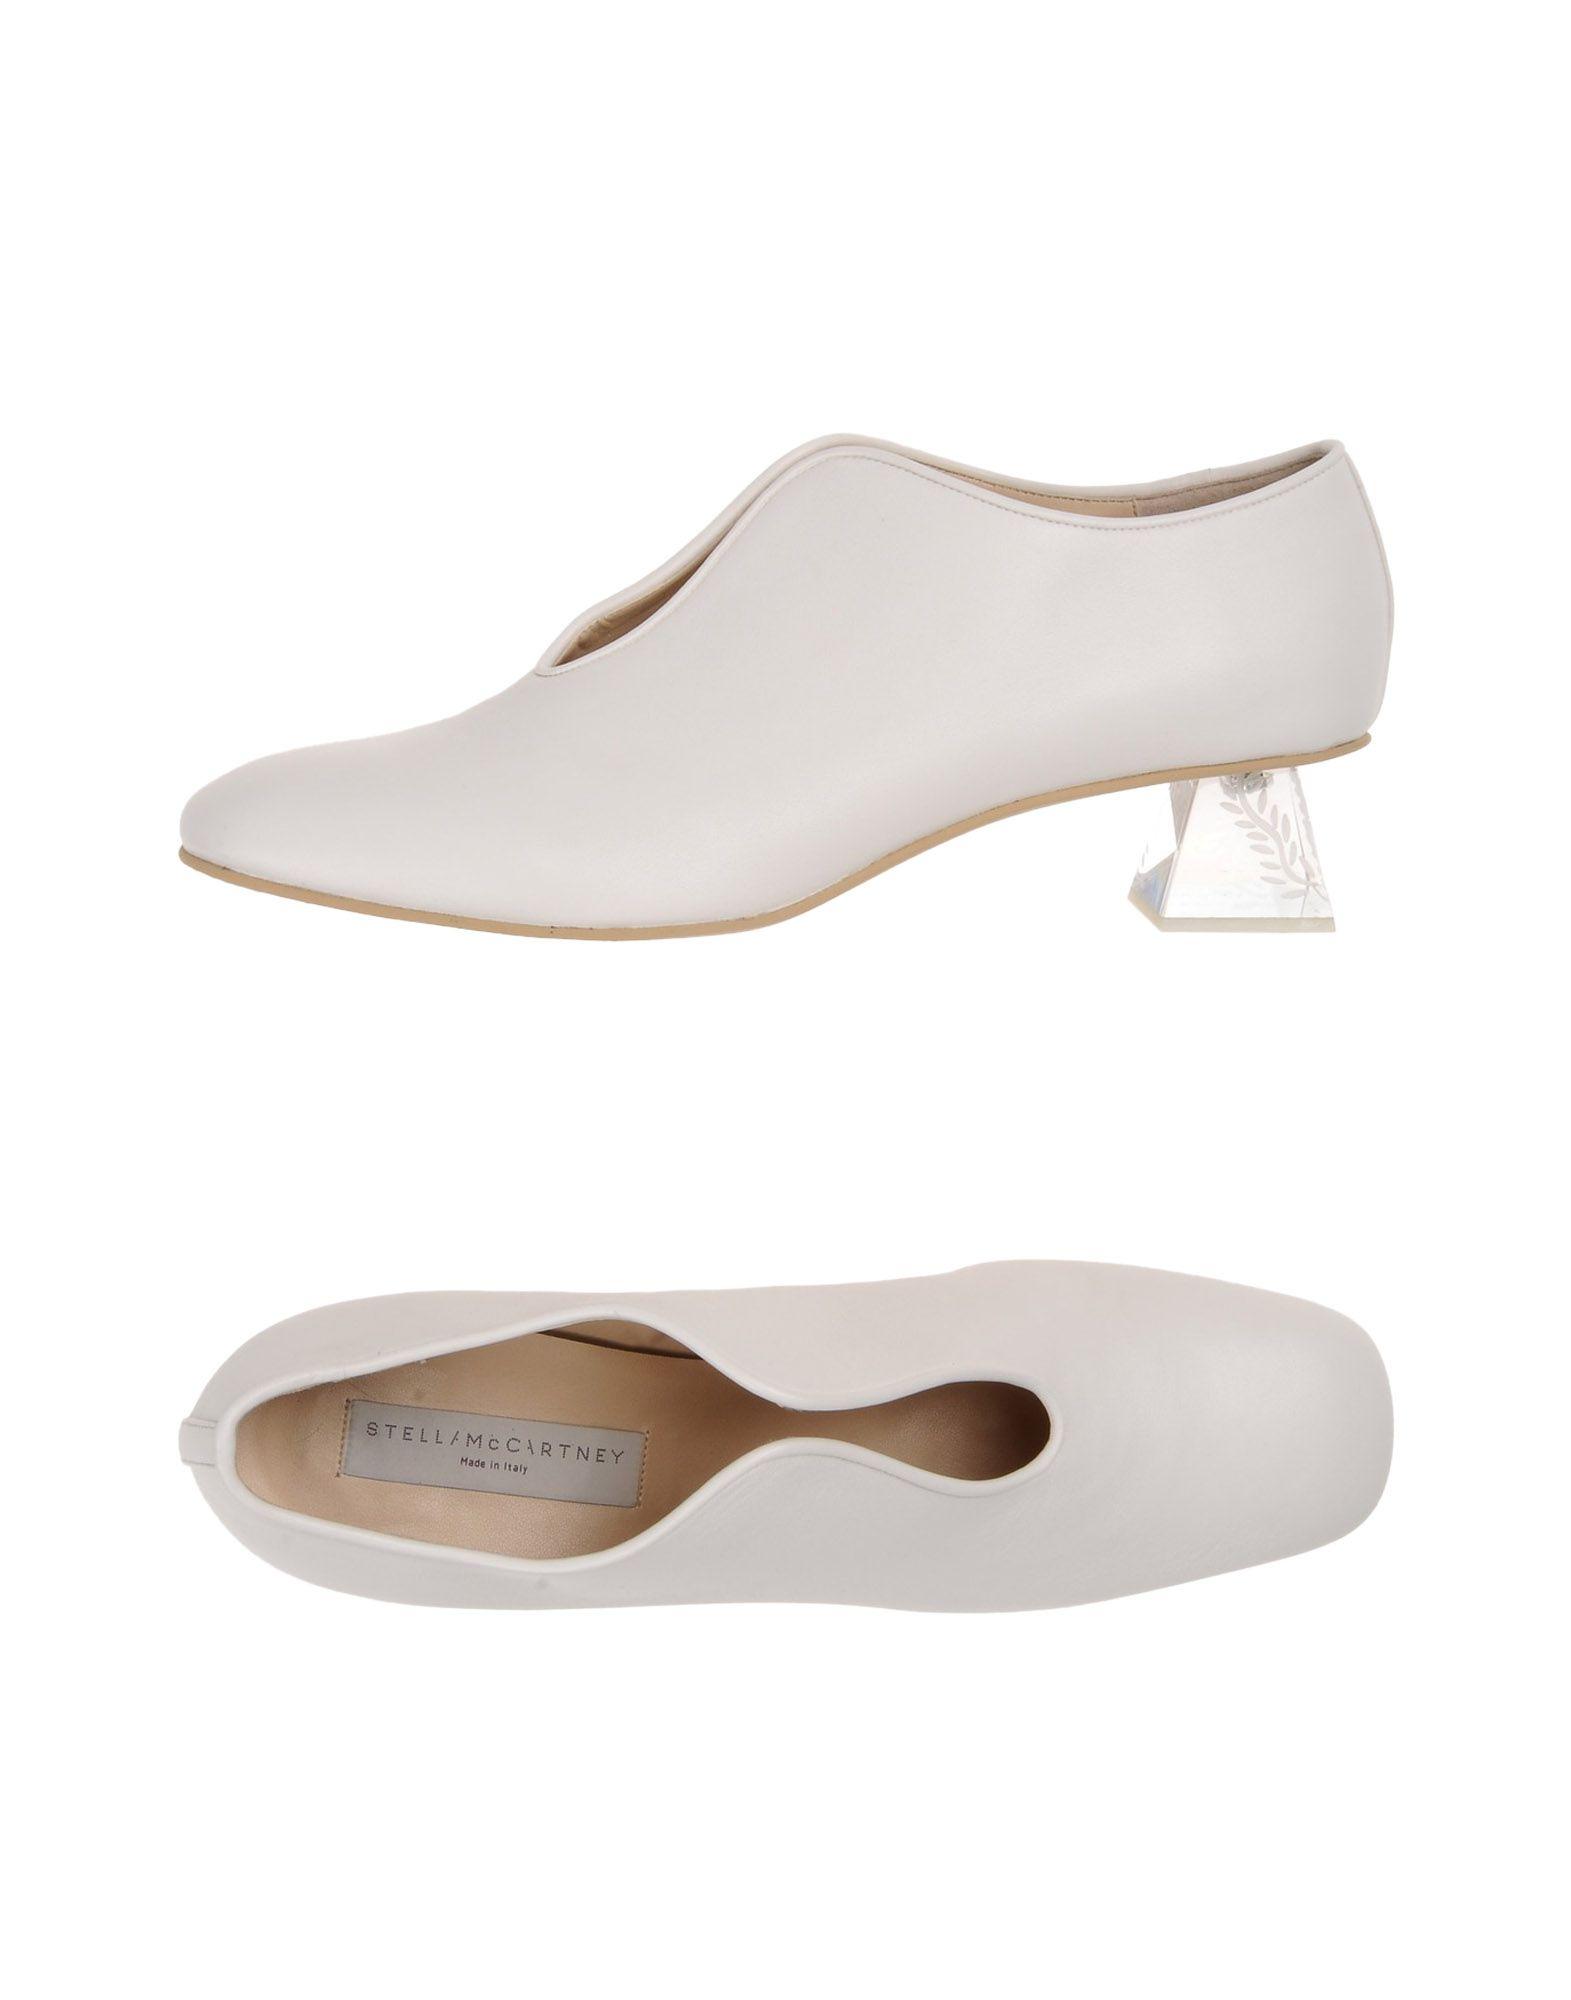 Stella Mccartney Mokassins Damen Schuhe  11124593URGünstige gut aussehende Schuhe Damen 23d7f5